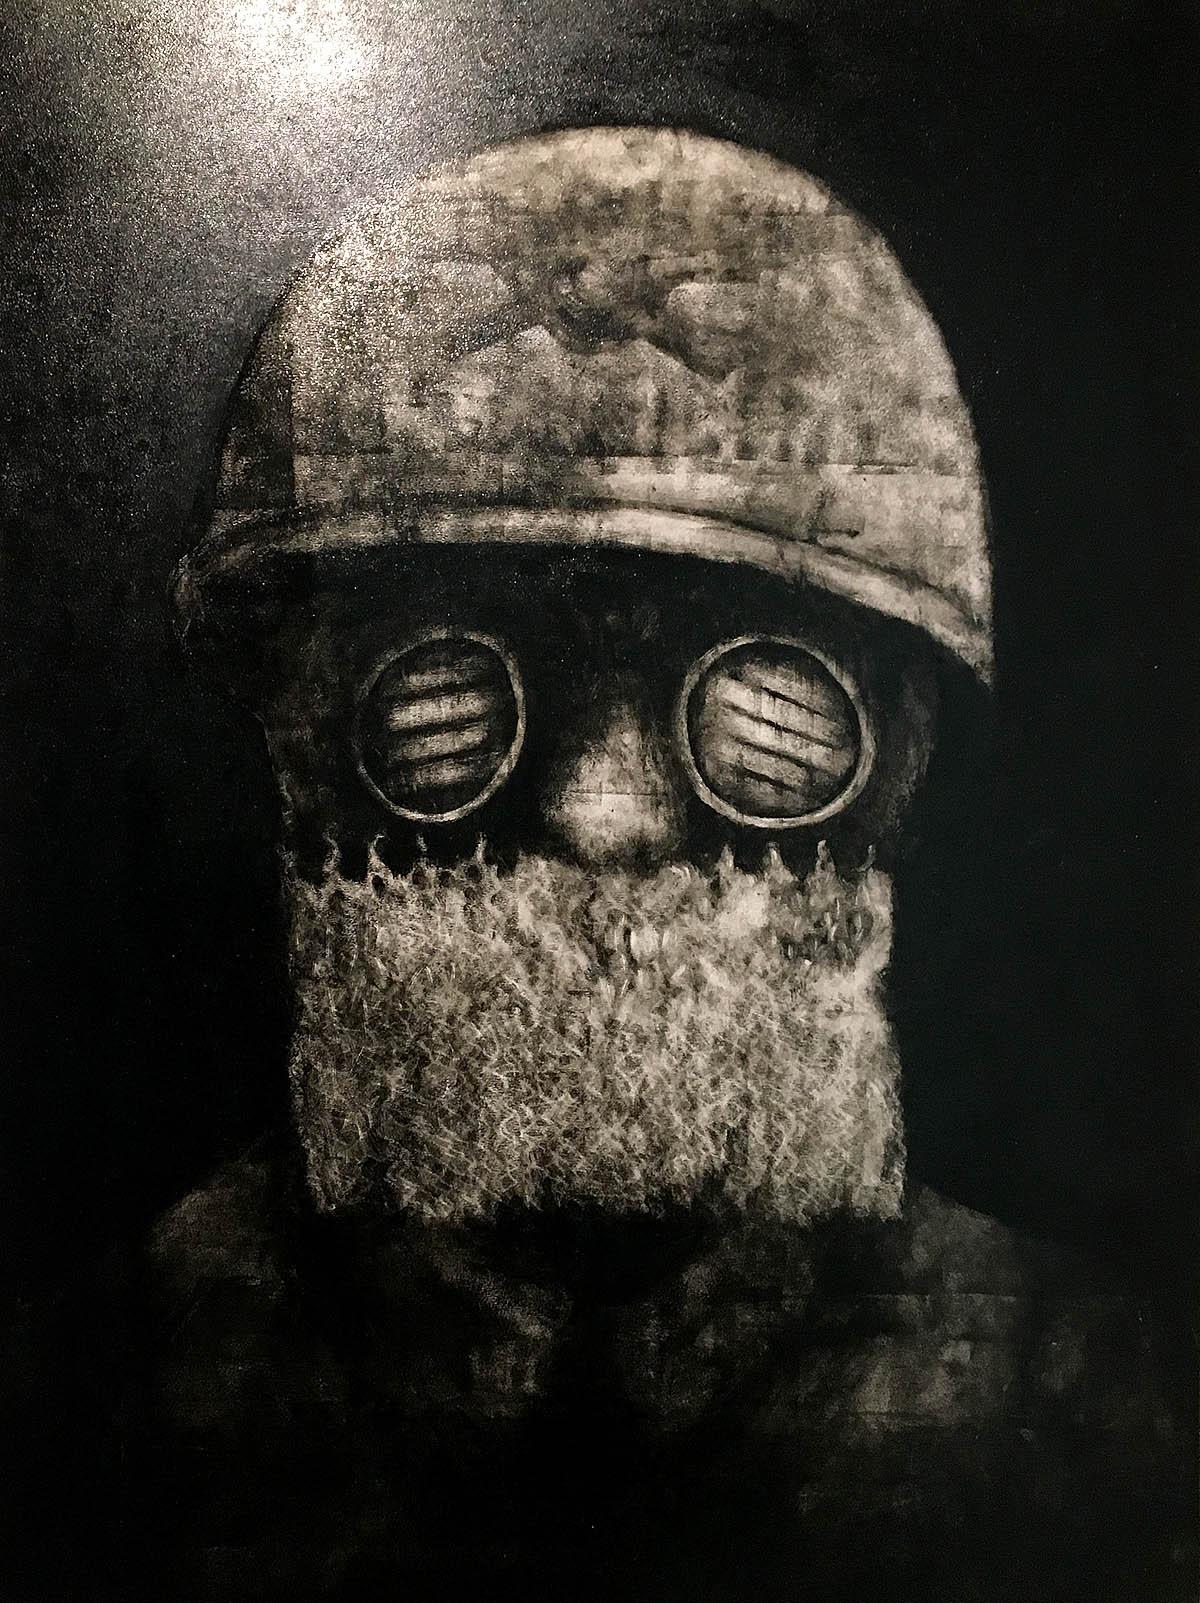 Veil of Despair, oil on panel